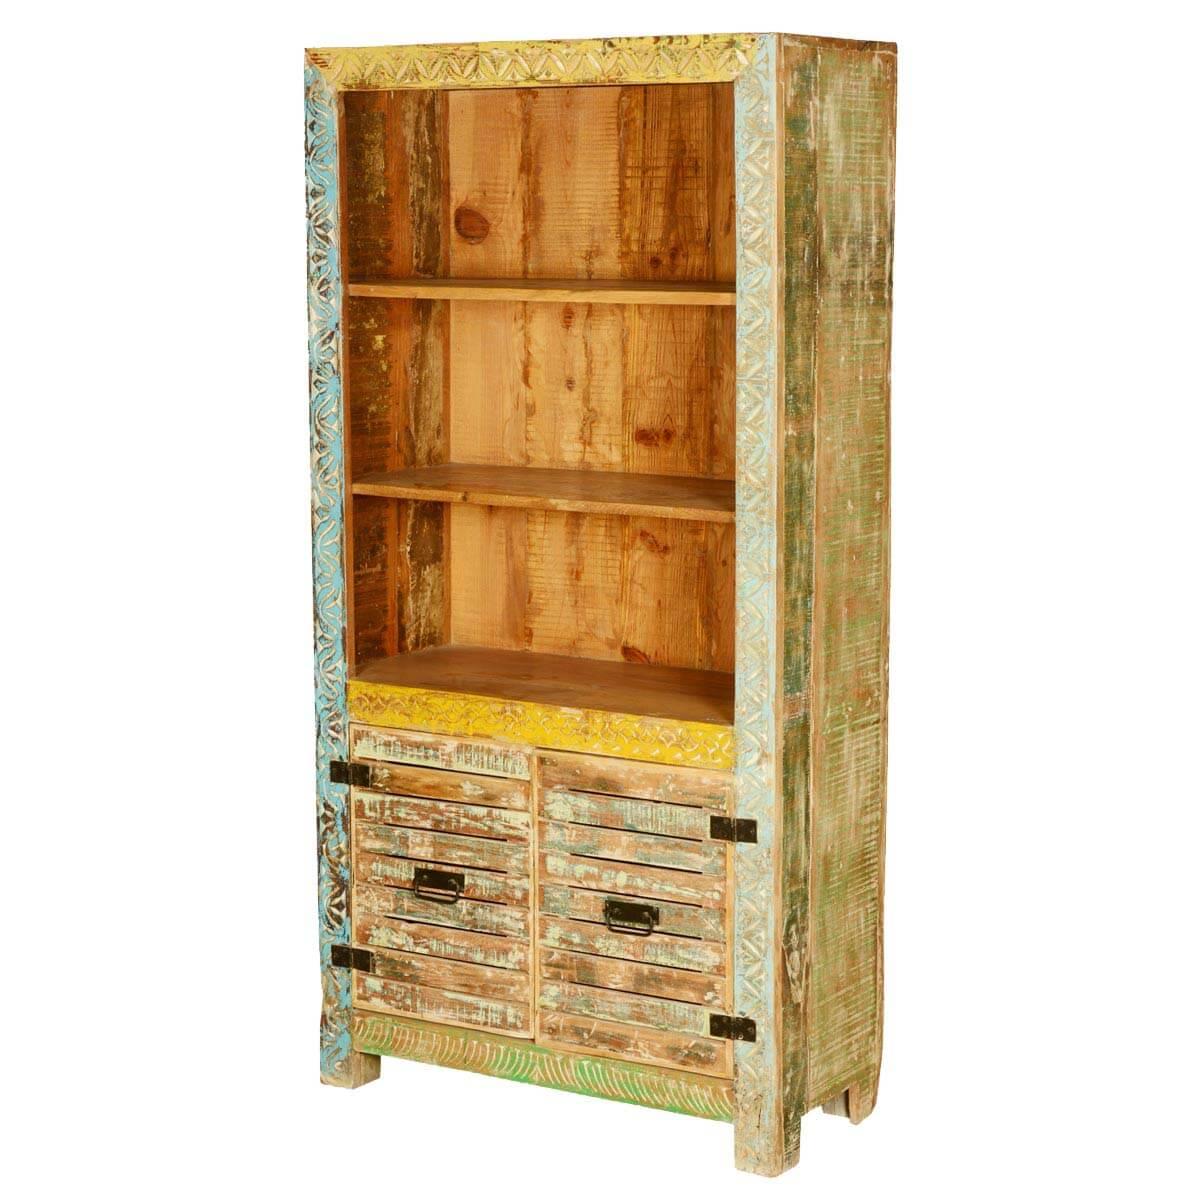 Saltillo 3 Open Shelf Rustic Reclaimed Wood Bookcase Hutch